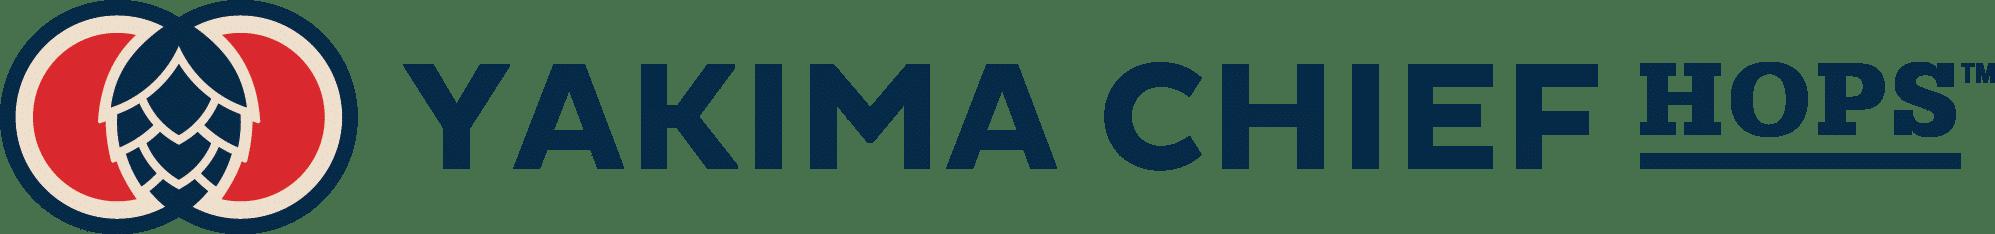 YakimaChief_Master_Logo_Horizontal